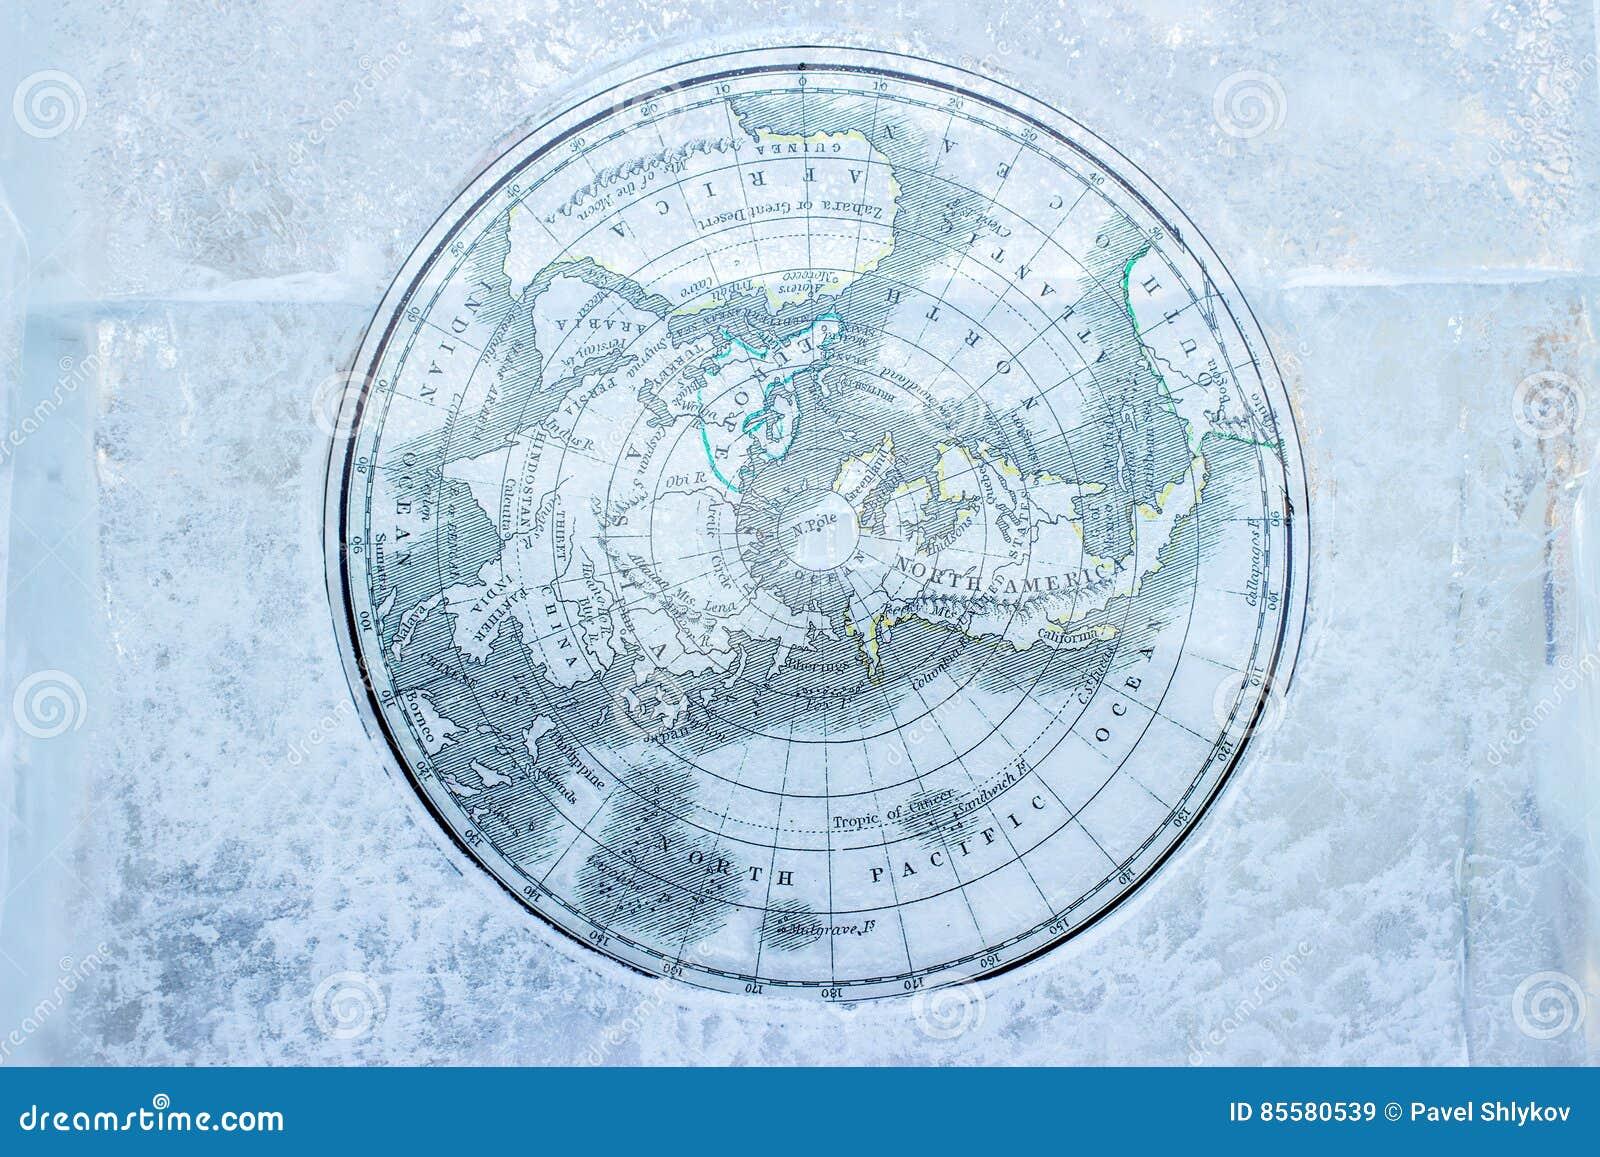 Vintage Arctic map on ice